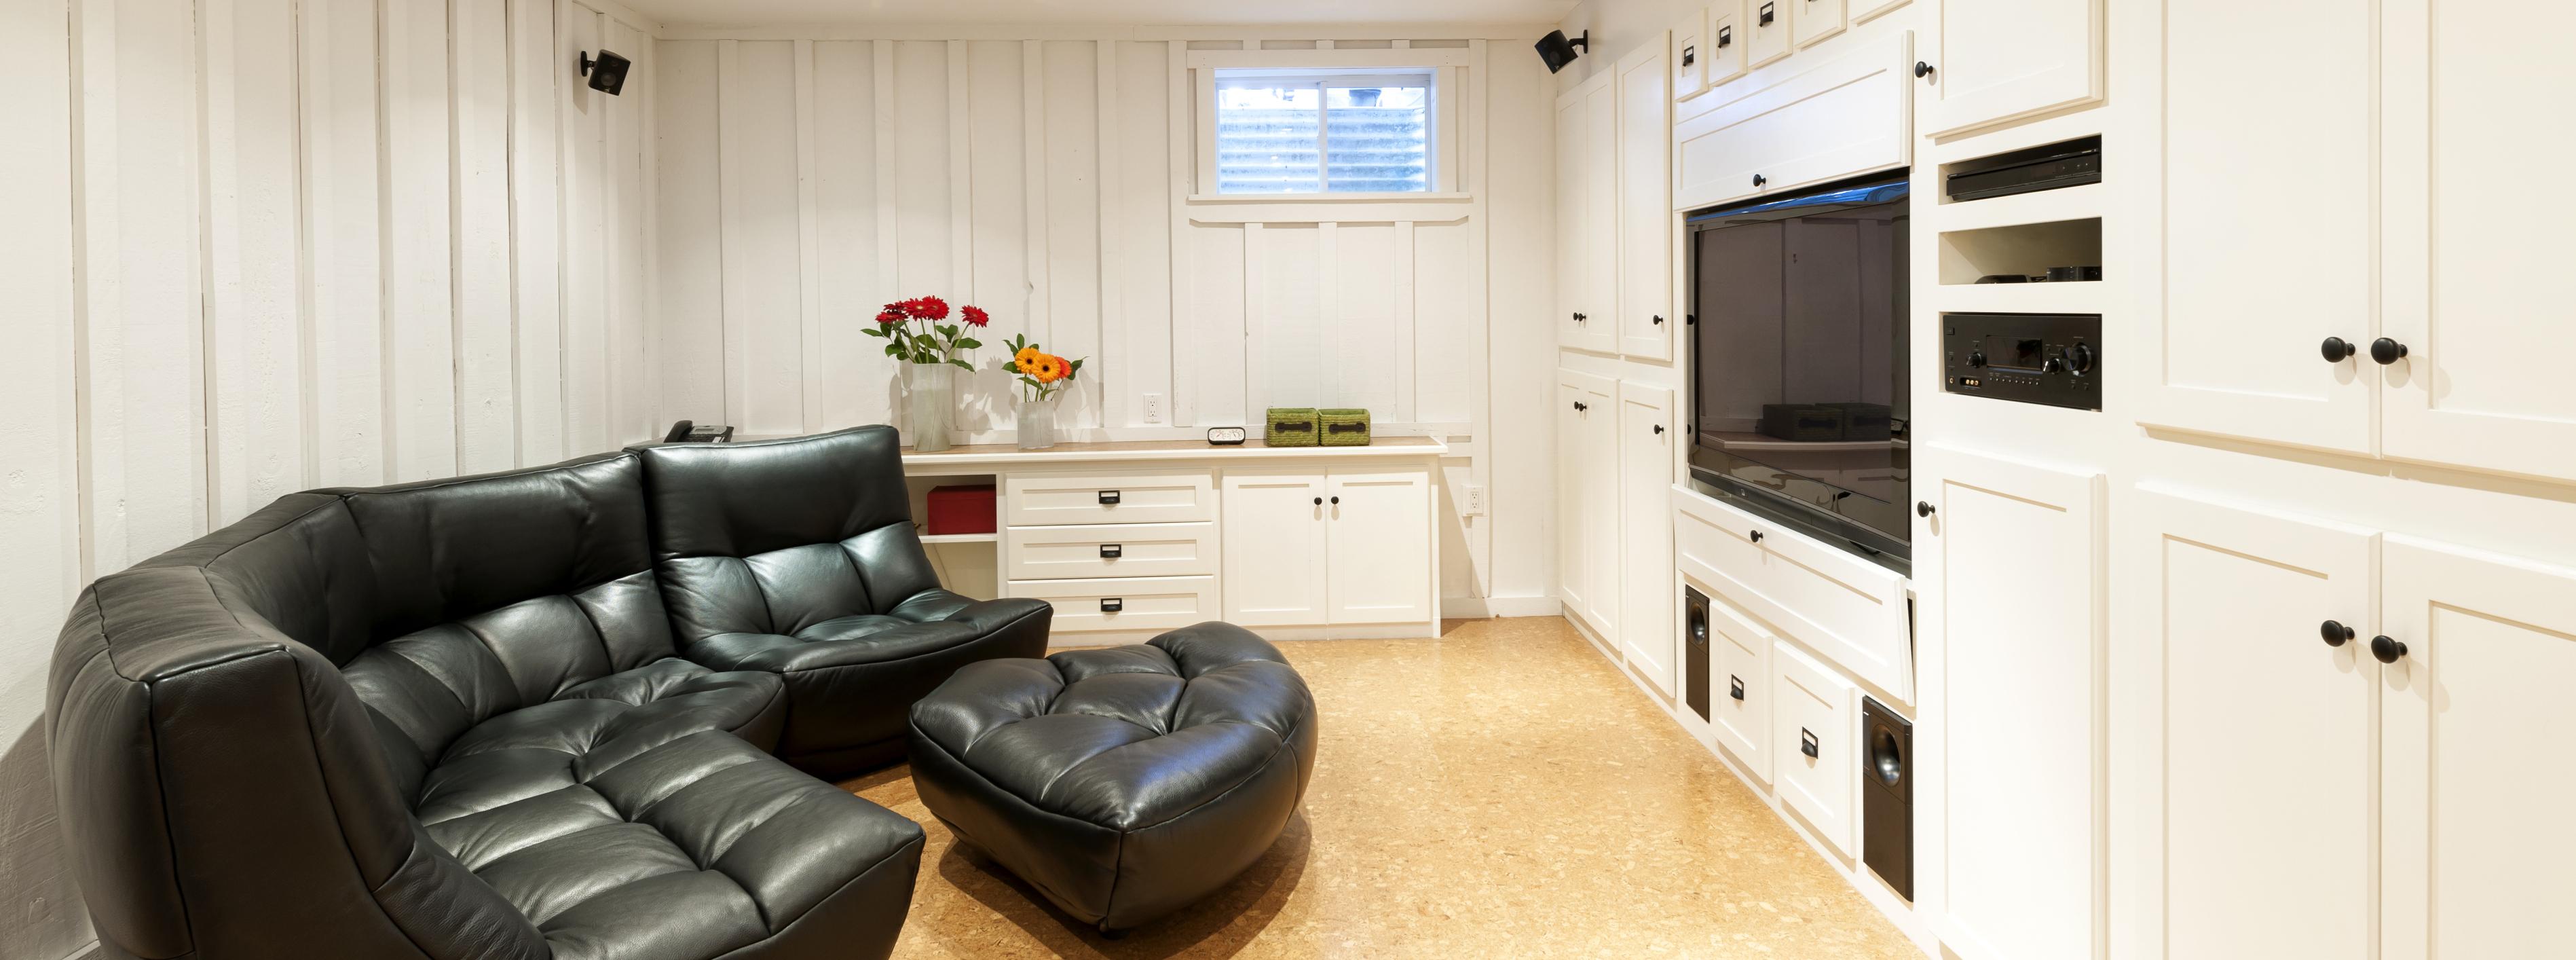 interior remodeling kitchen remodeling york pa Basement Remodeling Hanover PA